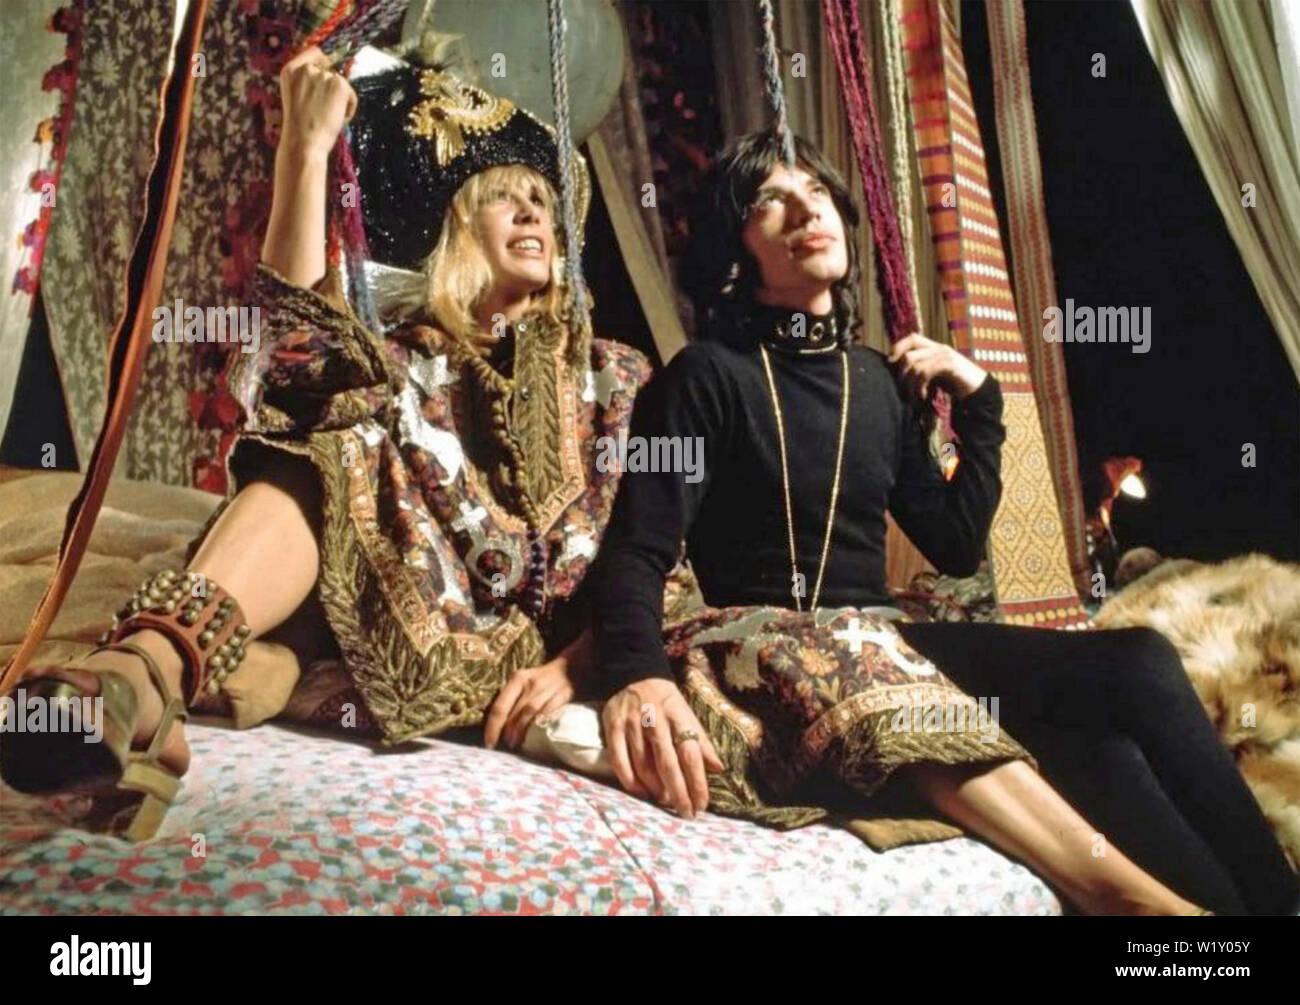 PERFORMANCE 1970 Warner Bros film with Mick Jagger and Anita Pallenberg - Stock Image